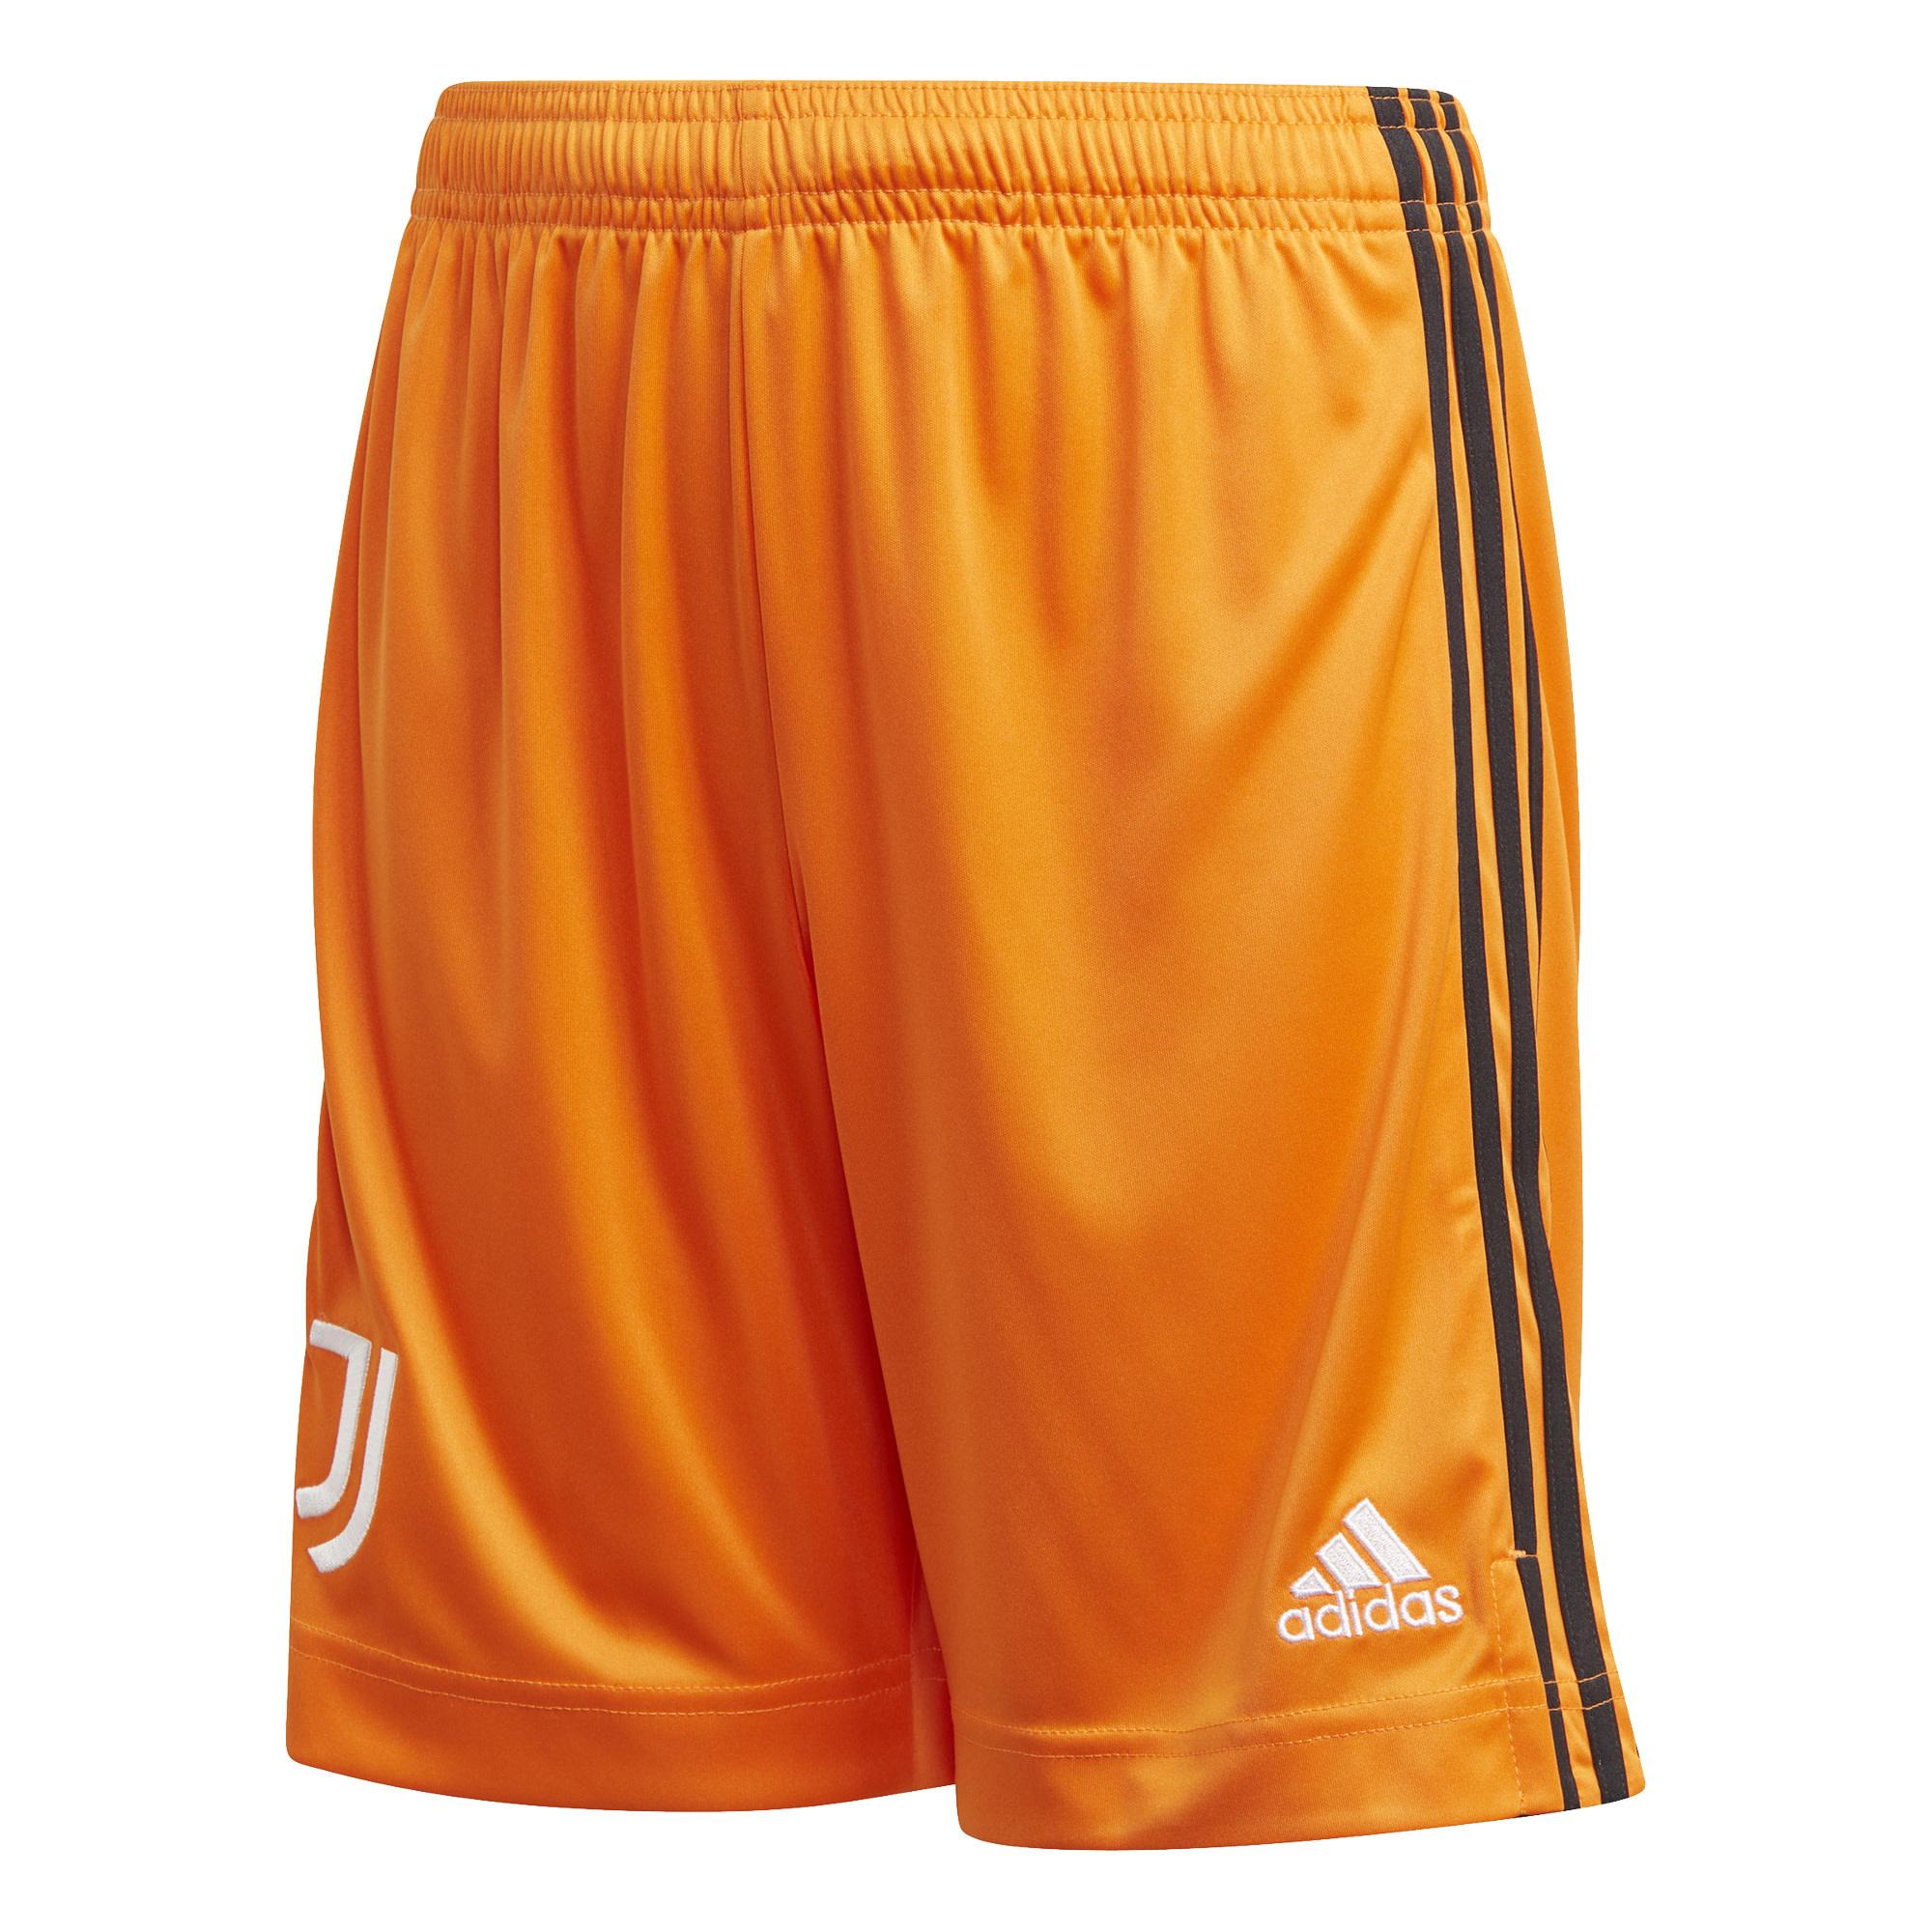 Adidas ADIDAS JR Juventus 3rd Short '20-'21